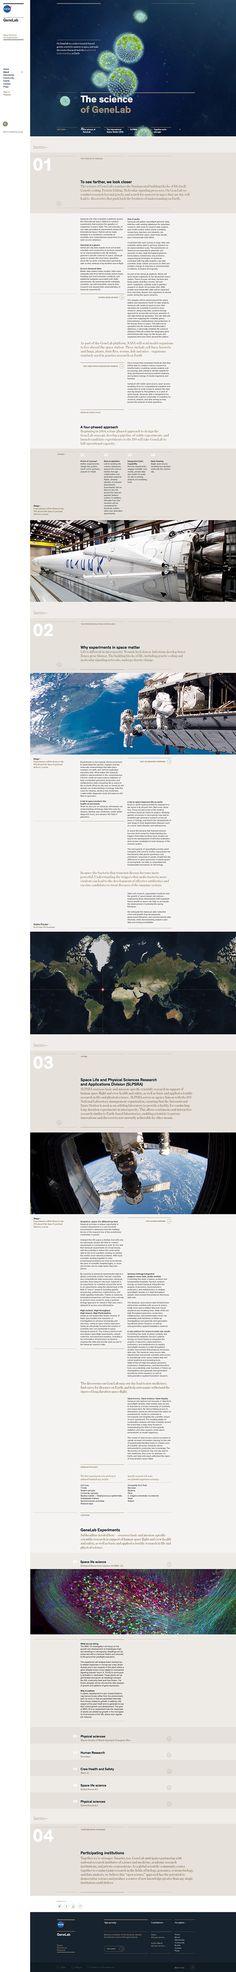 NASA GeneLab | Abduzeedo Design Inspiration